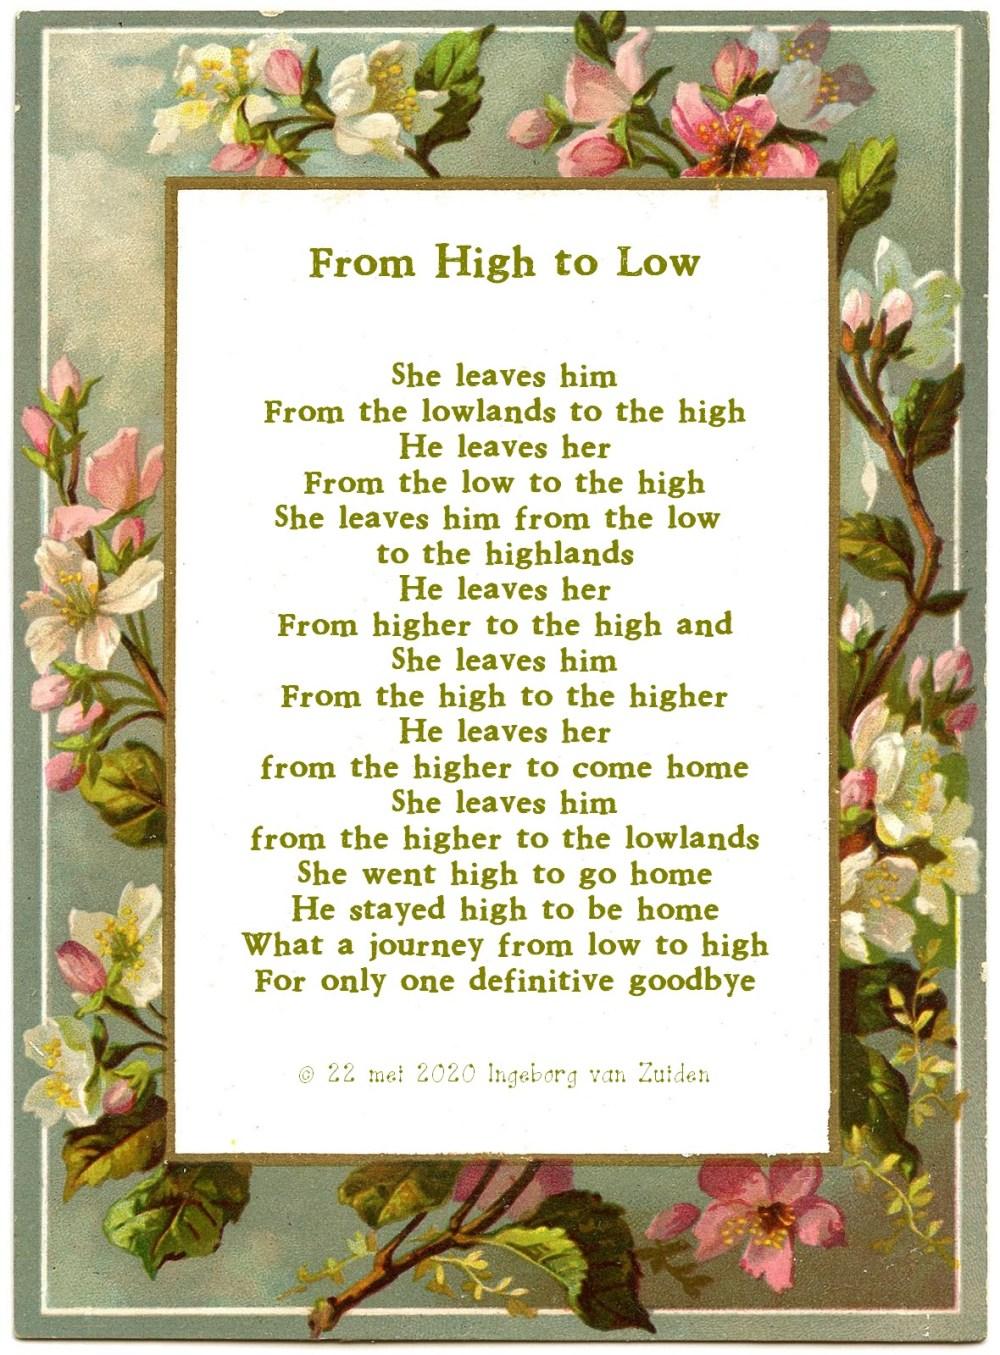 Poem 'From High to Low' by Ingeborg van Zuiden